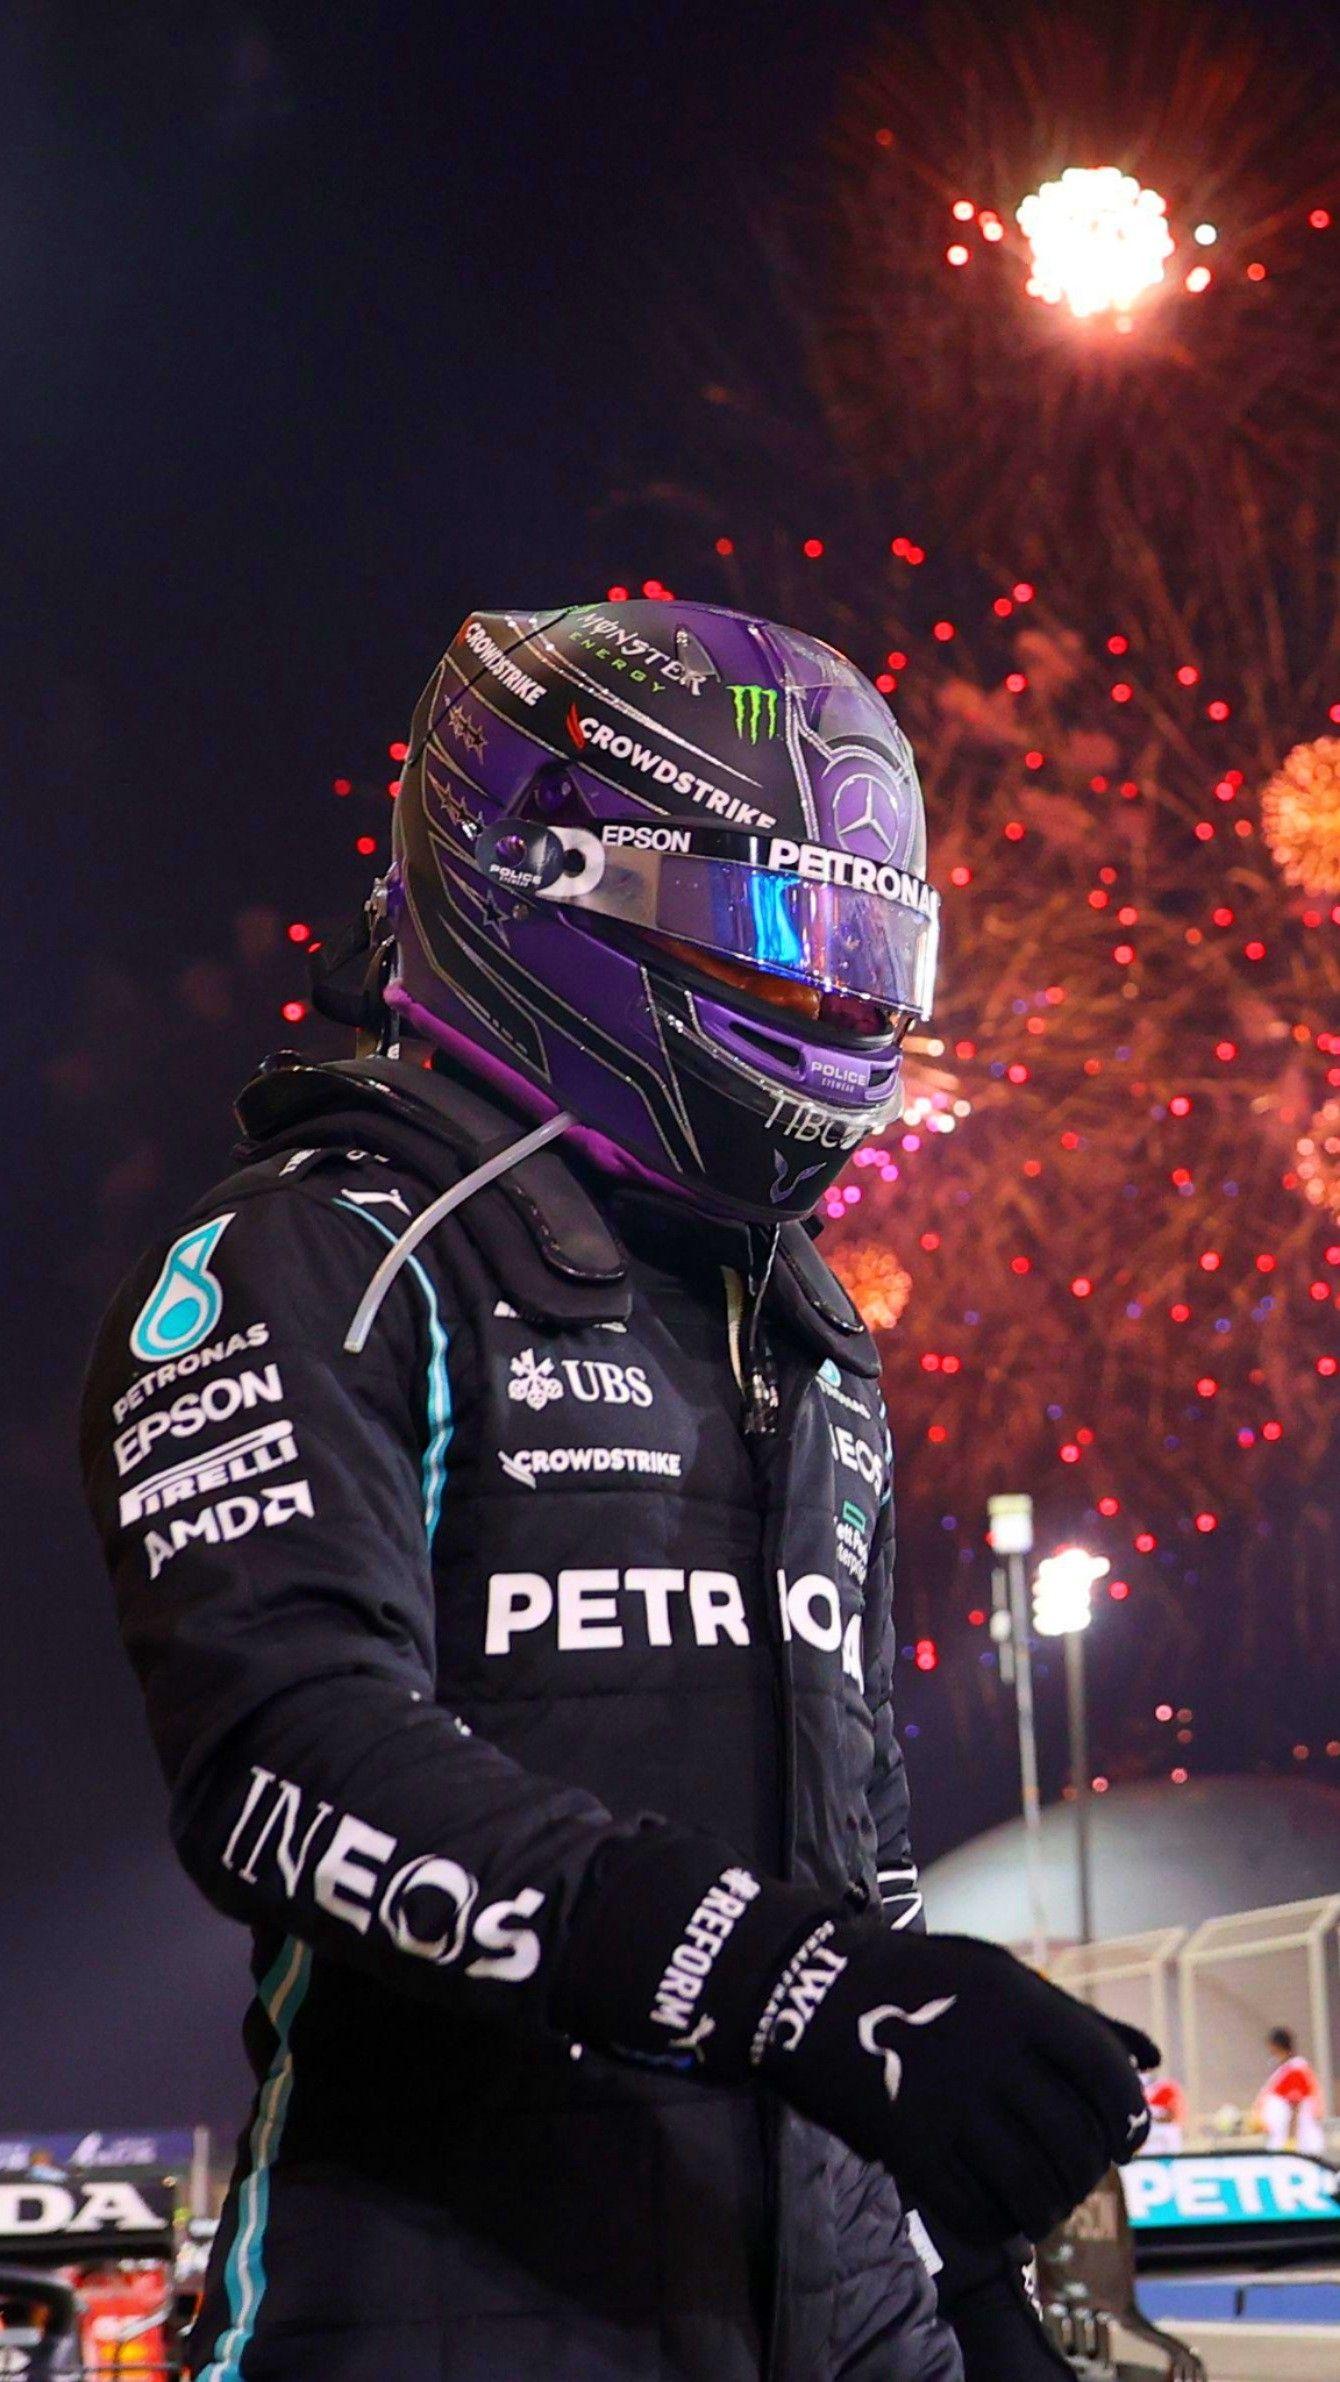 F1 Lewis Hamilton Bahrain GP win Wallpaper